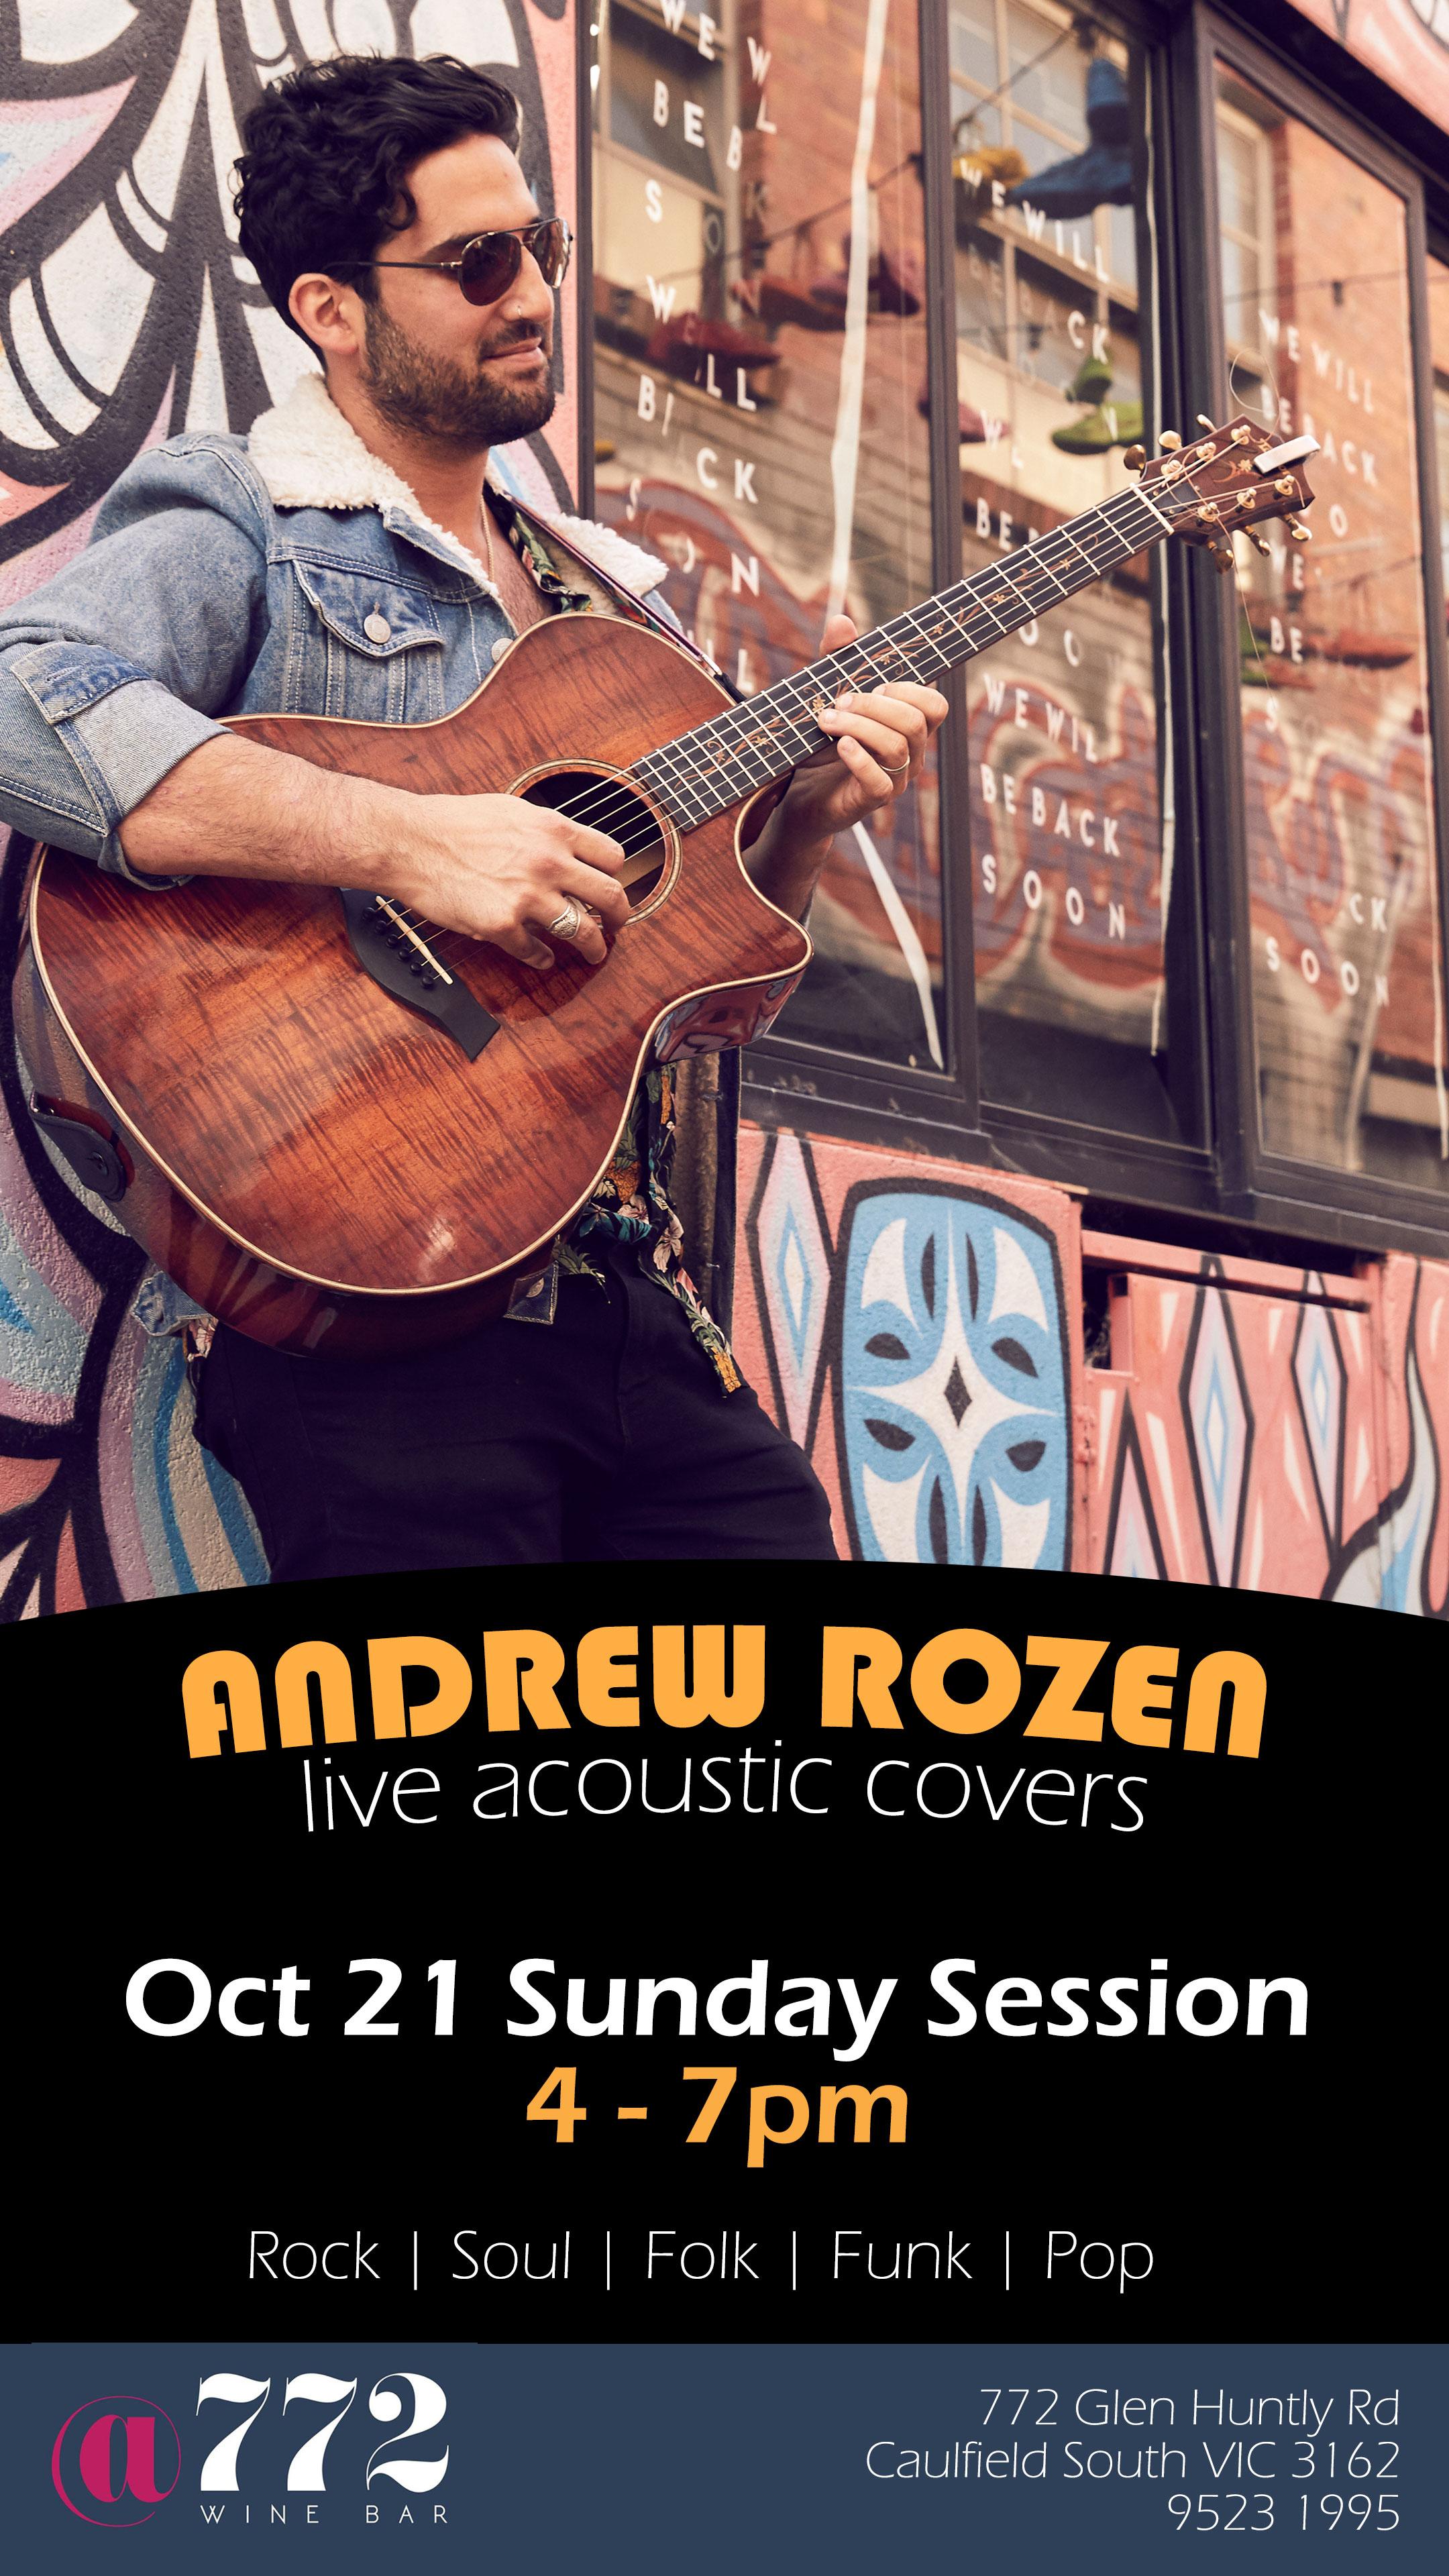 Andrew Rosen - 4pm - 7pm